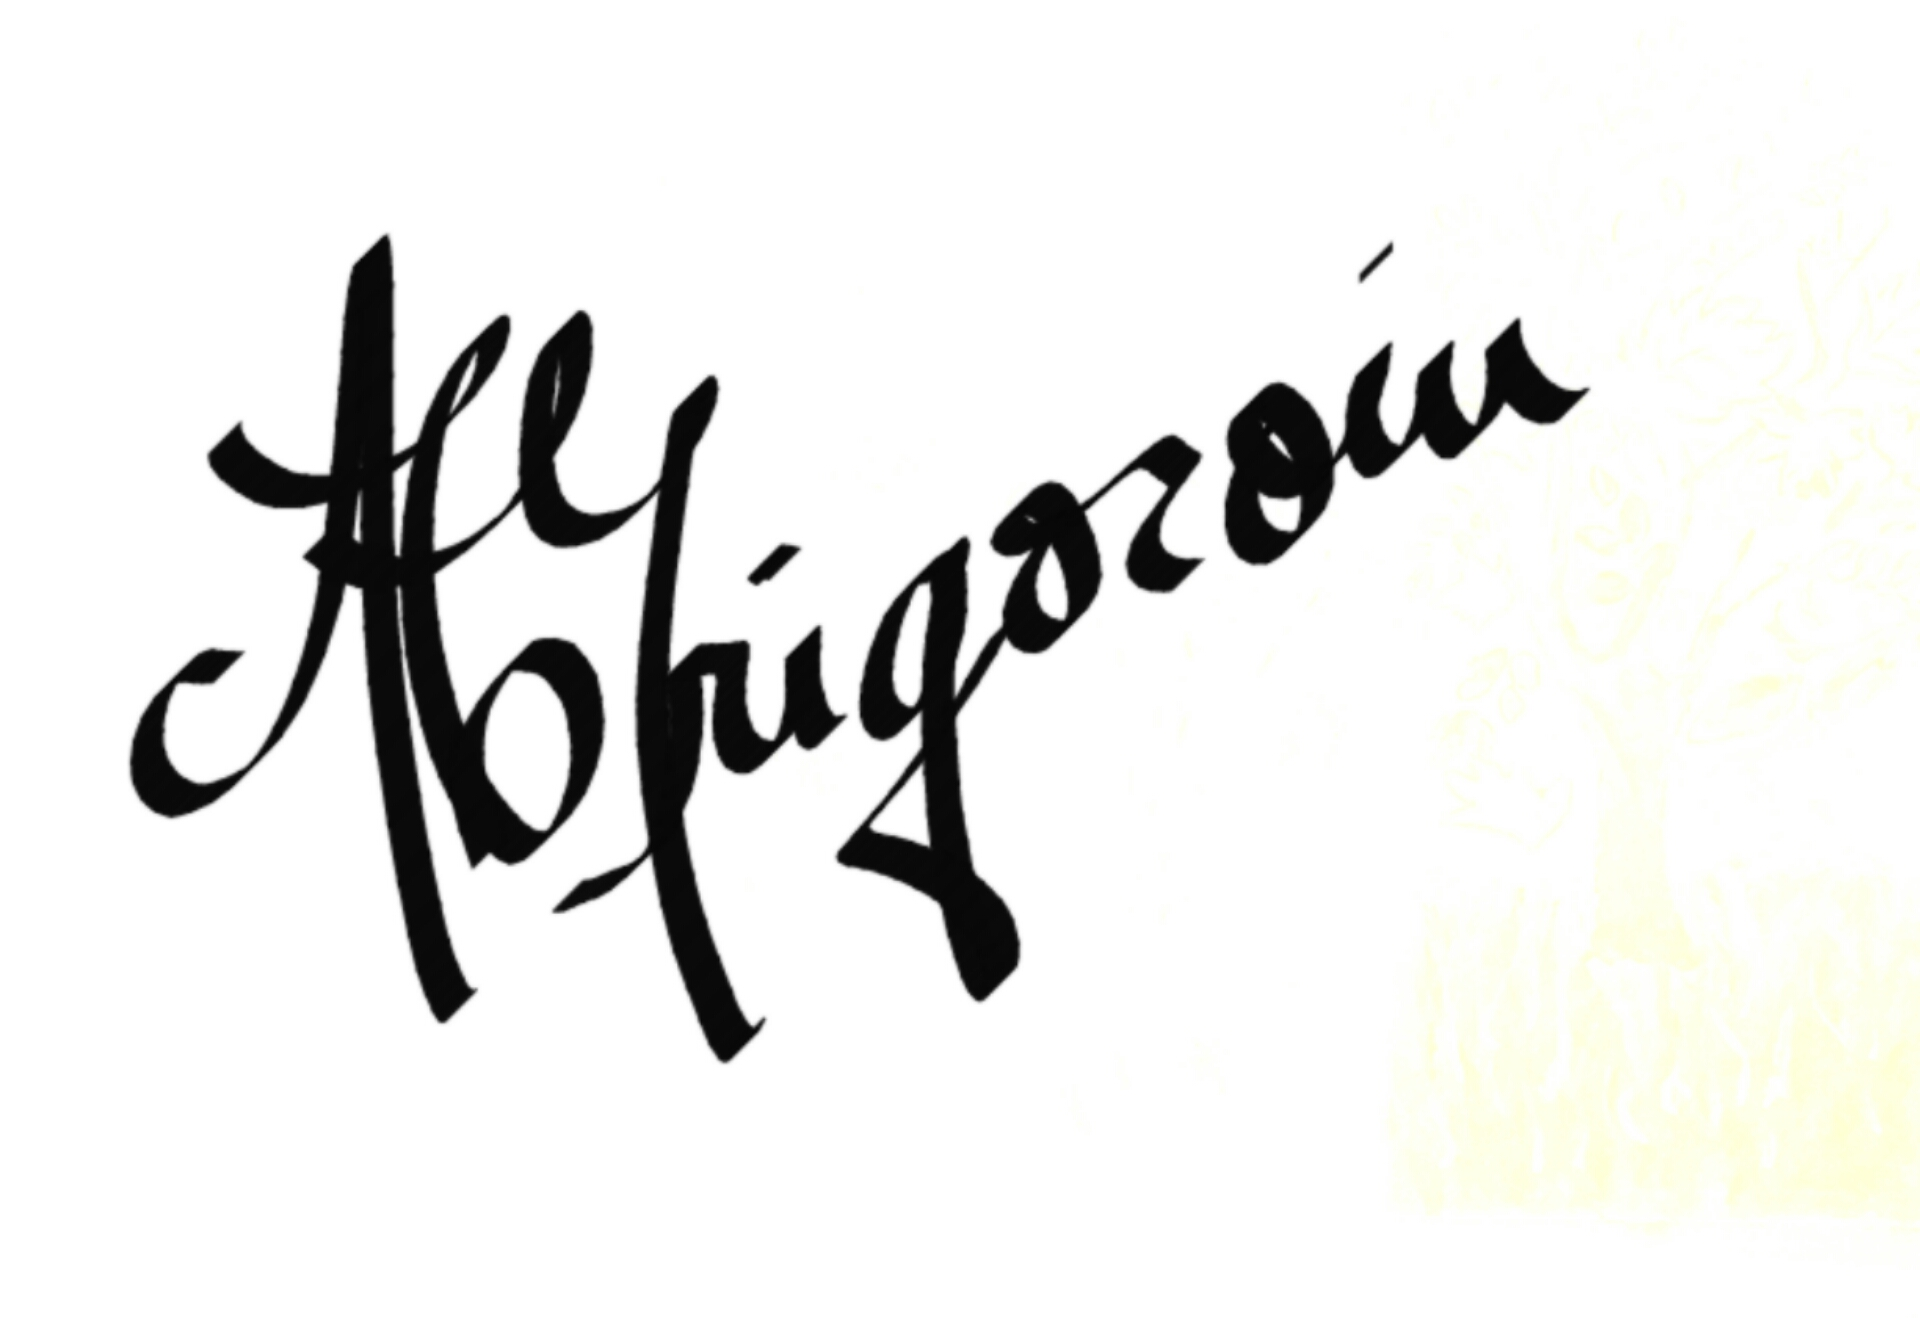 Ana Cristina Grigoroiu's Signature